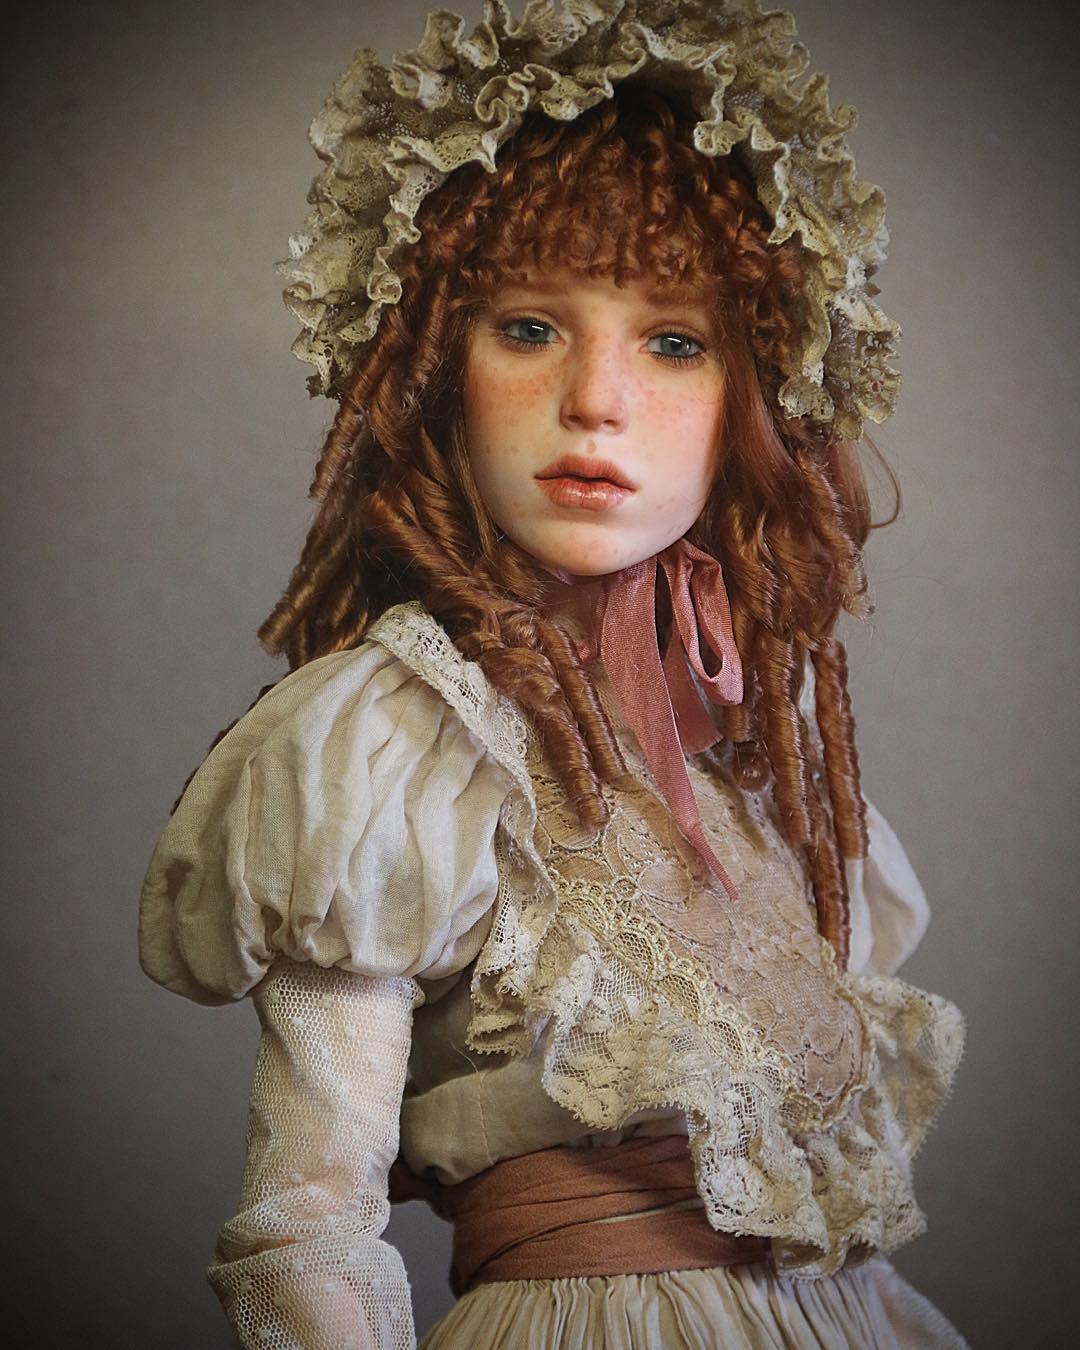 куклы своими руками, изготовление кукол своими руками, куклы сделанные руками фото-5